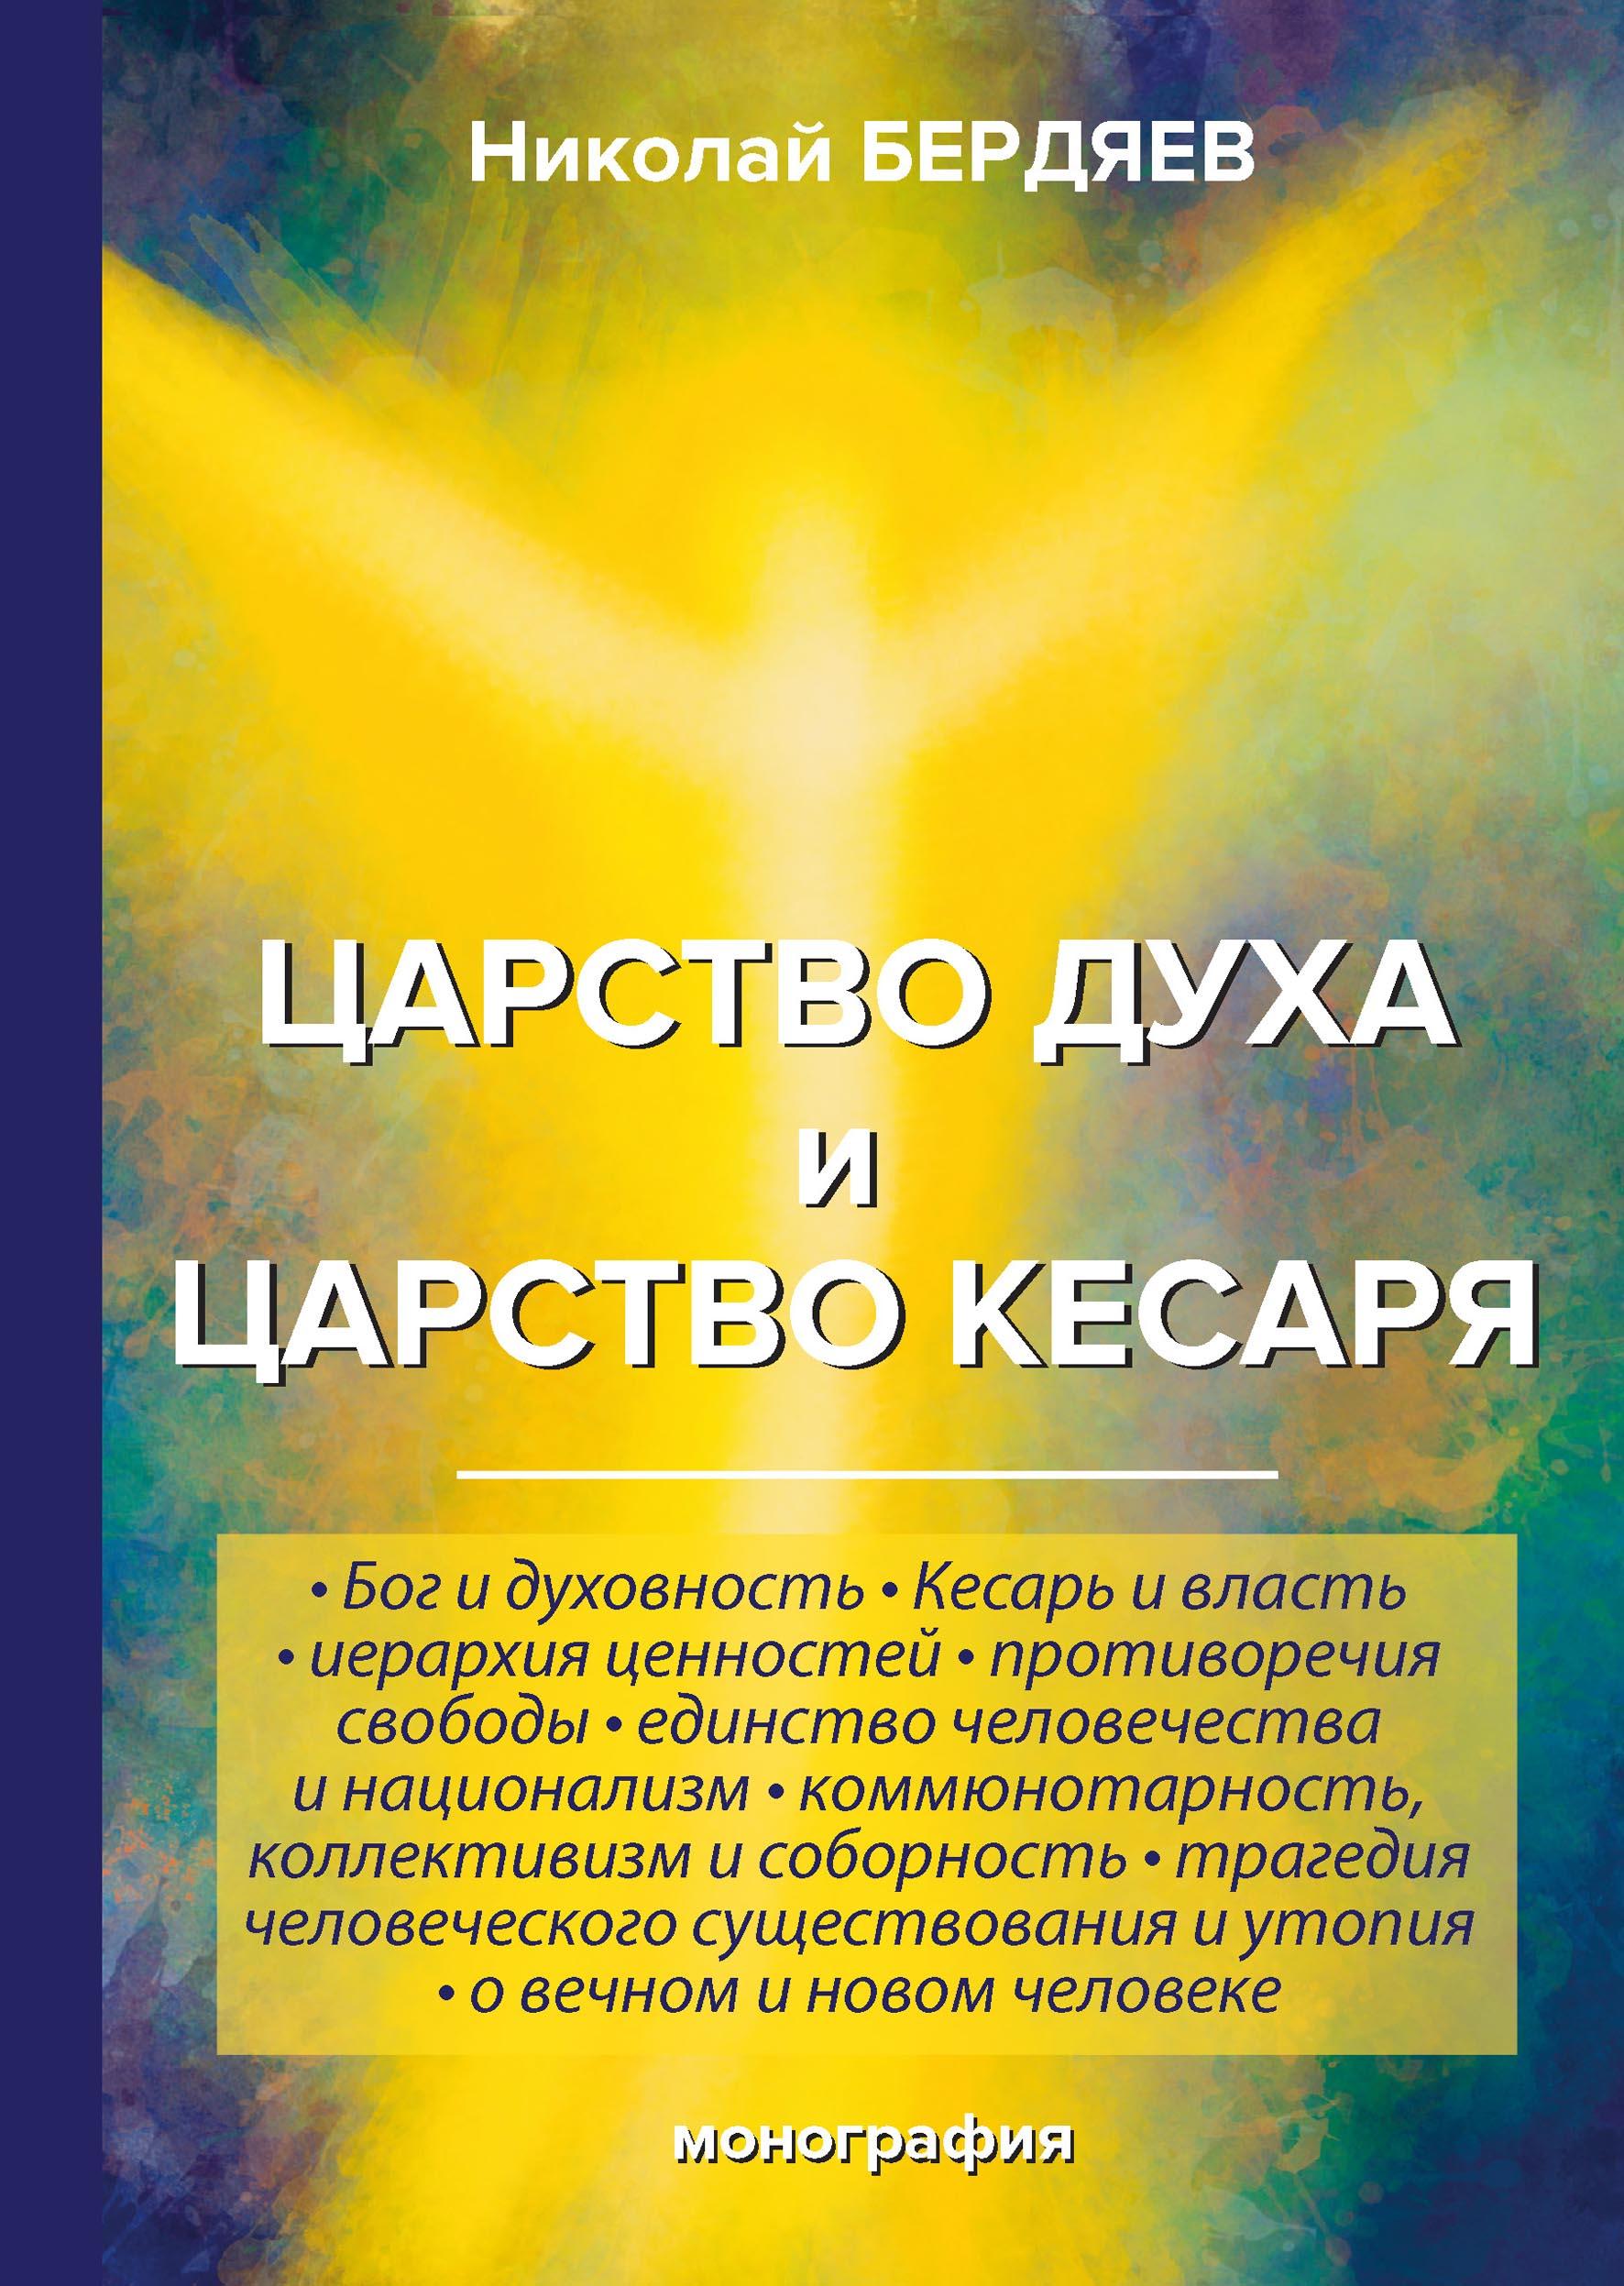 Николай Бердяев Царство духа и царство кесаря а в тихонов подводное царство